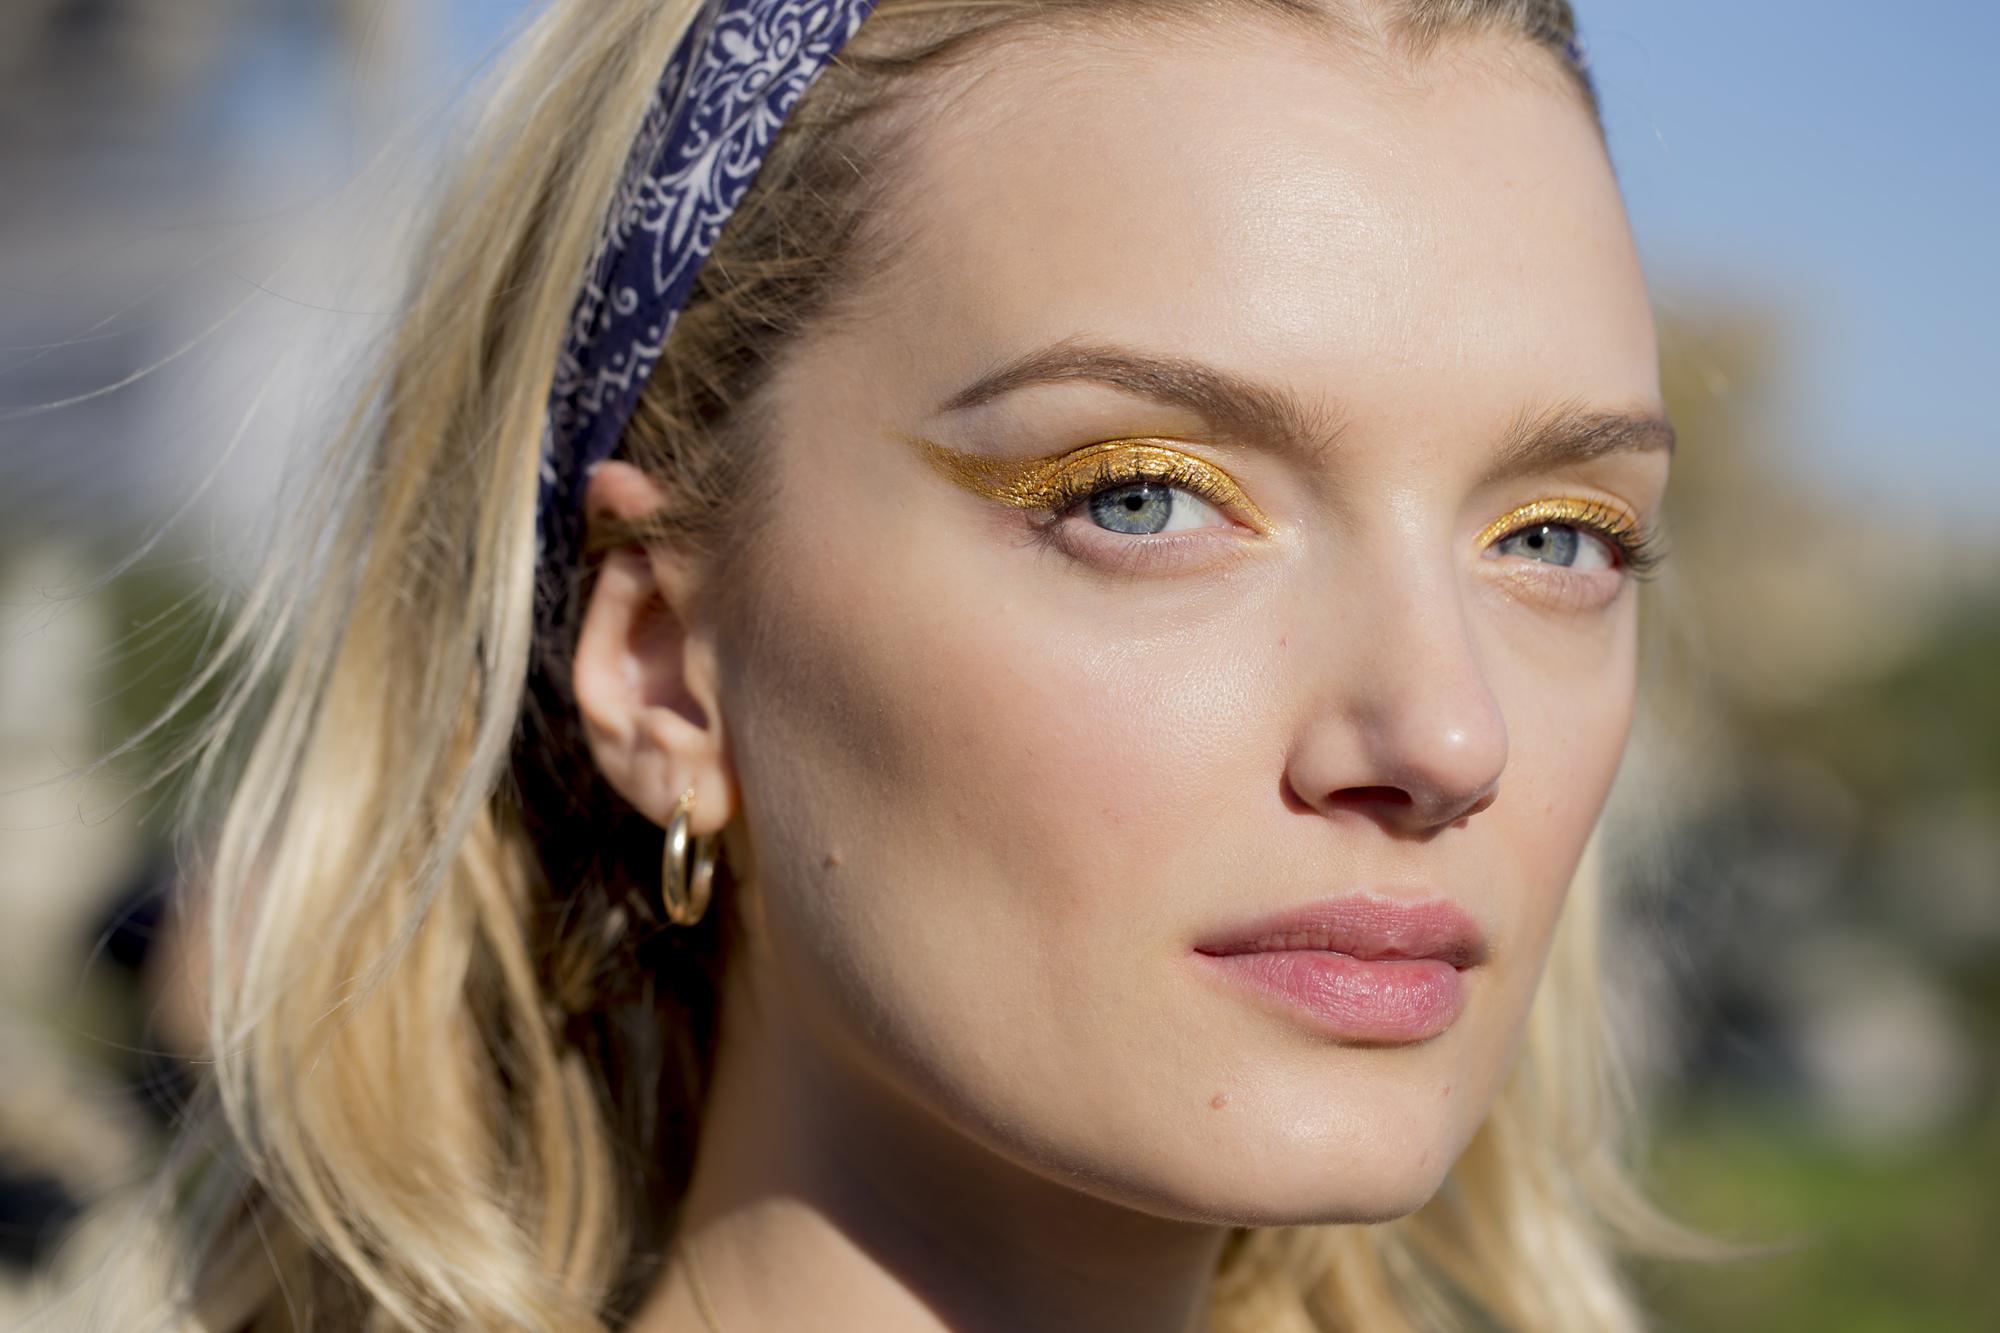 pat-mcgrath-kim-kardashian-makeup-maquiagem-beleza-pigmento-sombra-linha-gold-001